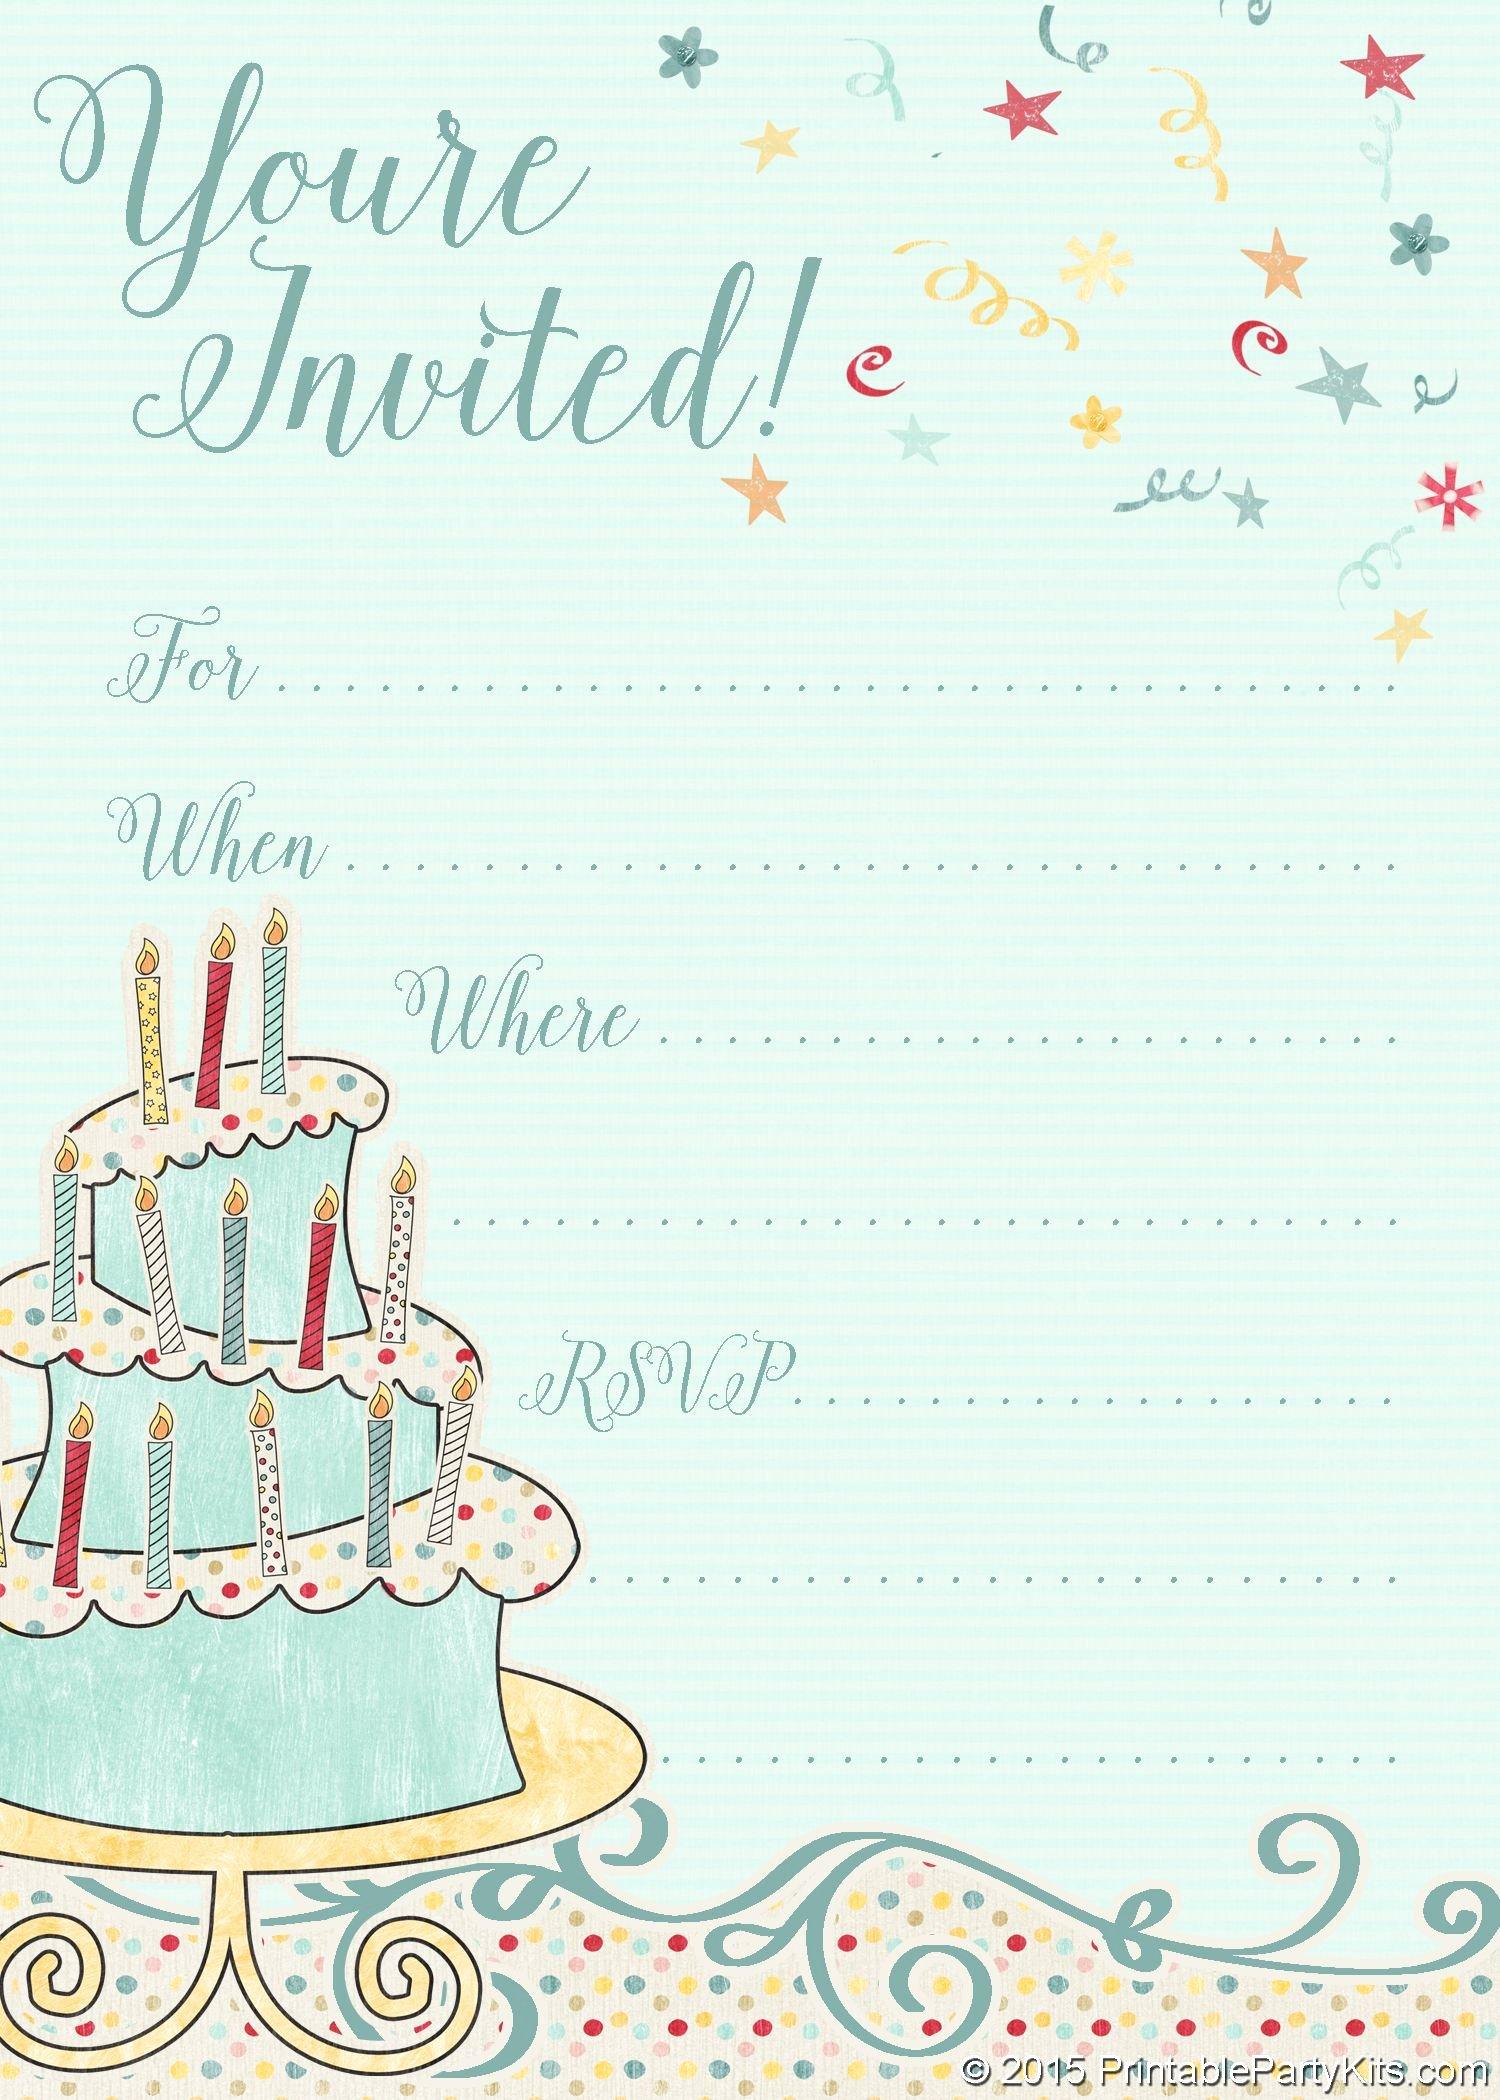 Free Printable Birthday Invitation Templates Lovely Free Printable Whimsical Birthday Party Invitation